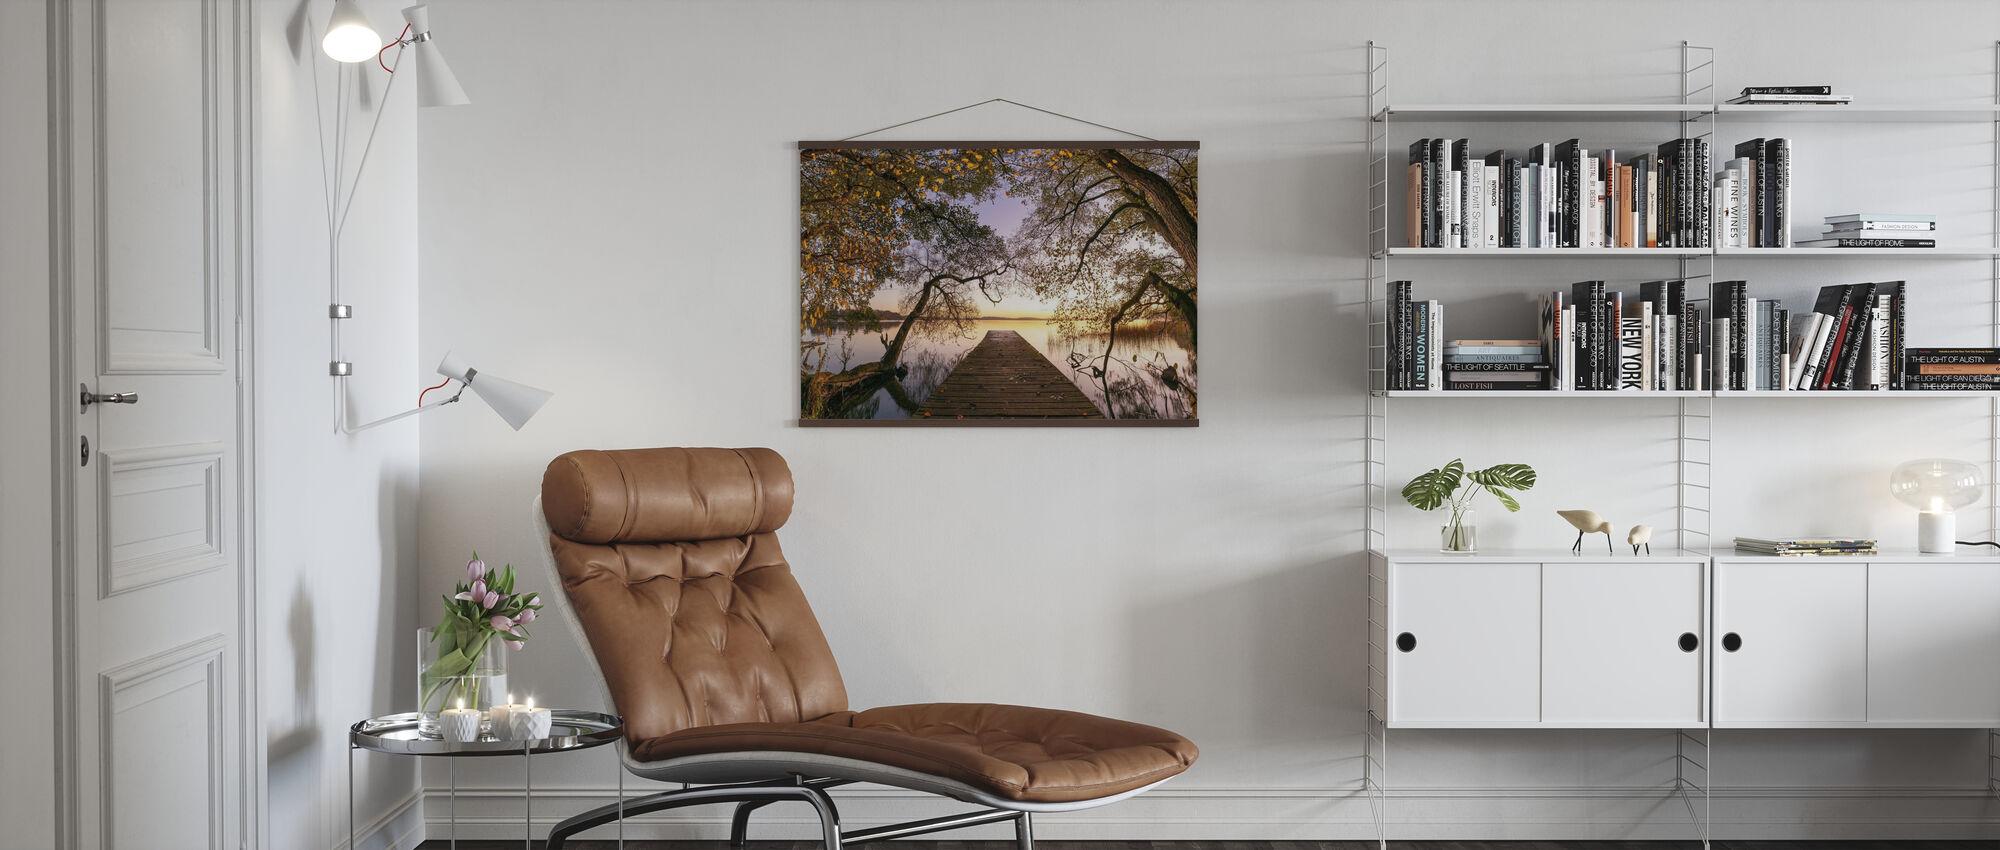 Efterår - Plakat - Stue